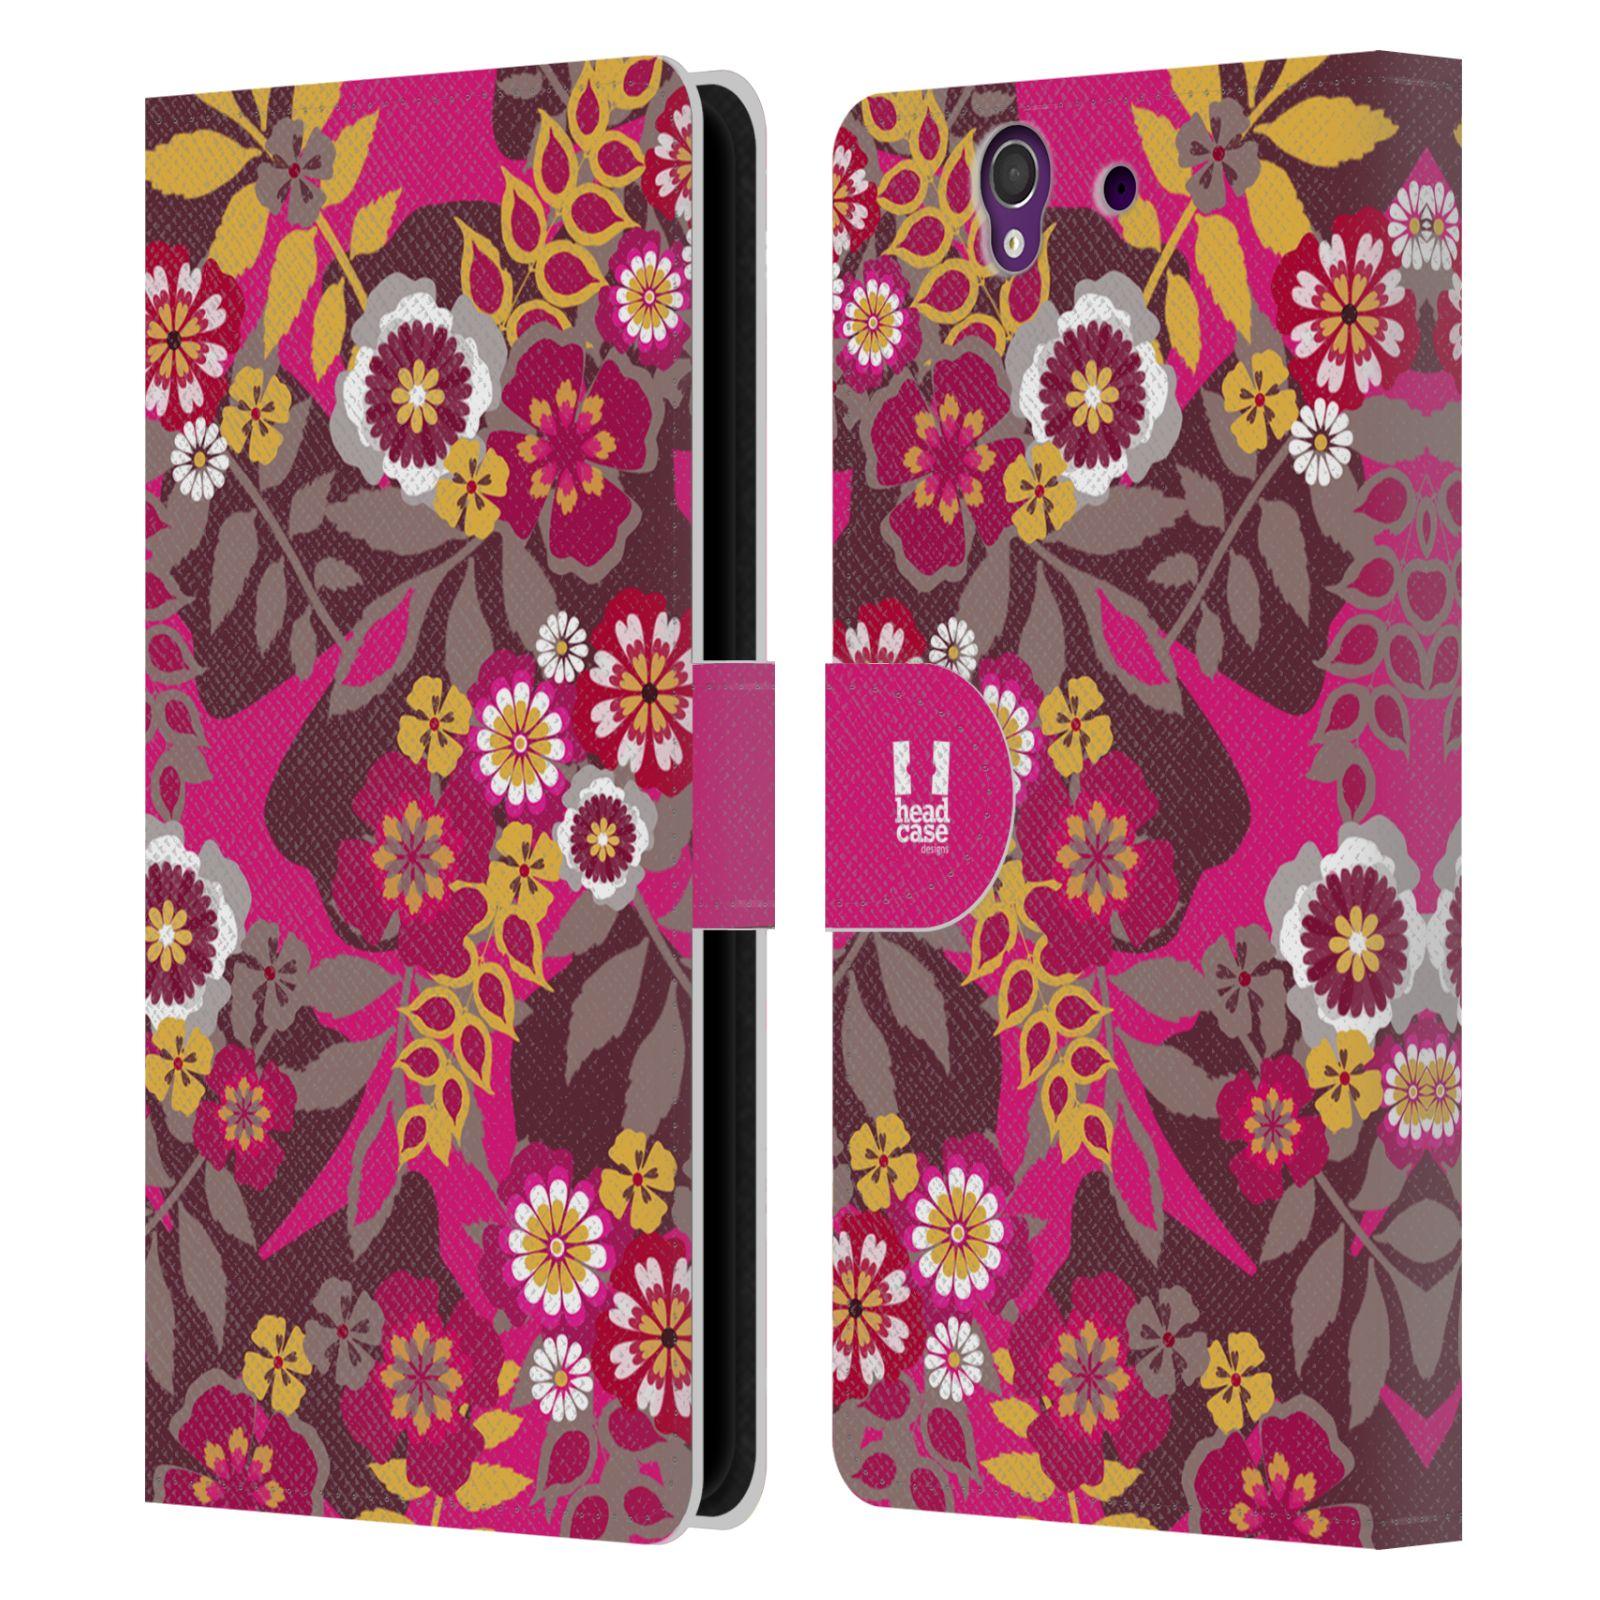 HEAD CASE Flipové pouzdro pro mobil SONY XPERIA Z (C6603) BOTANIKA růžová a hnědá